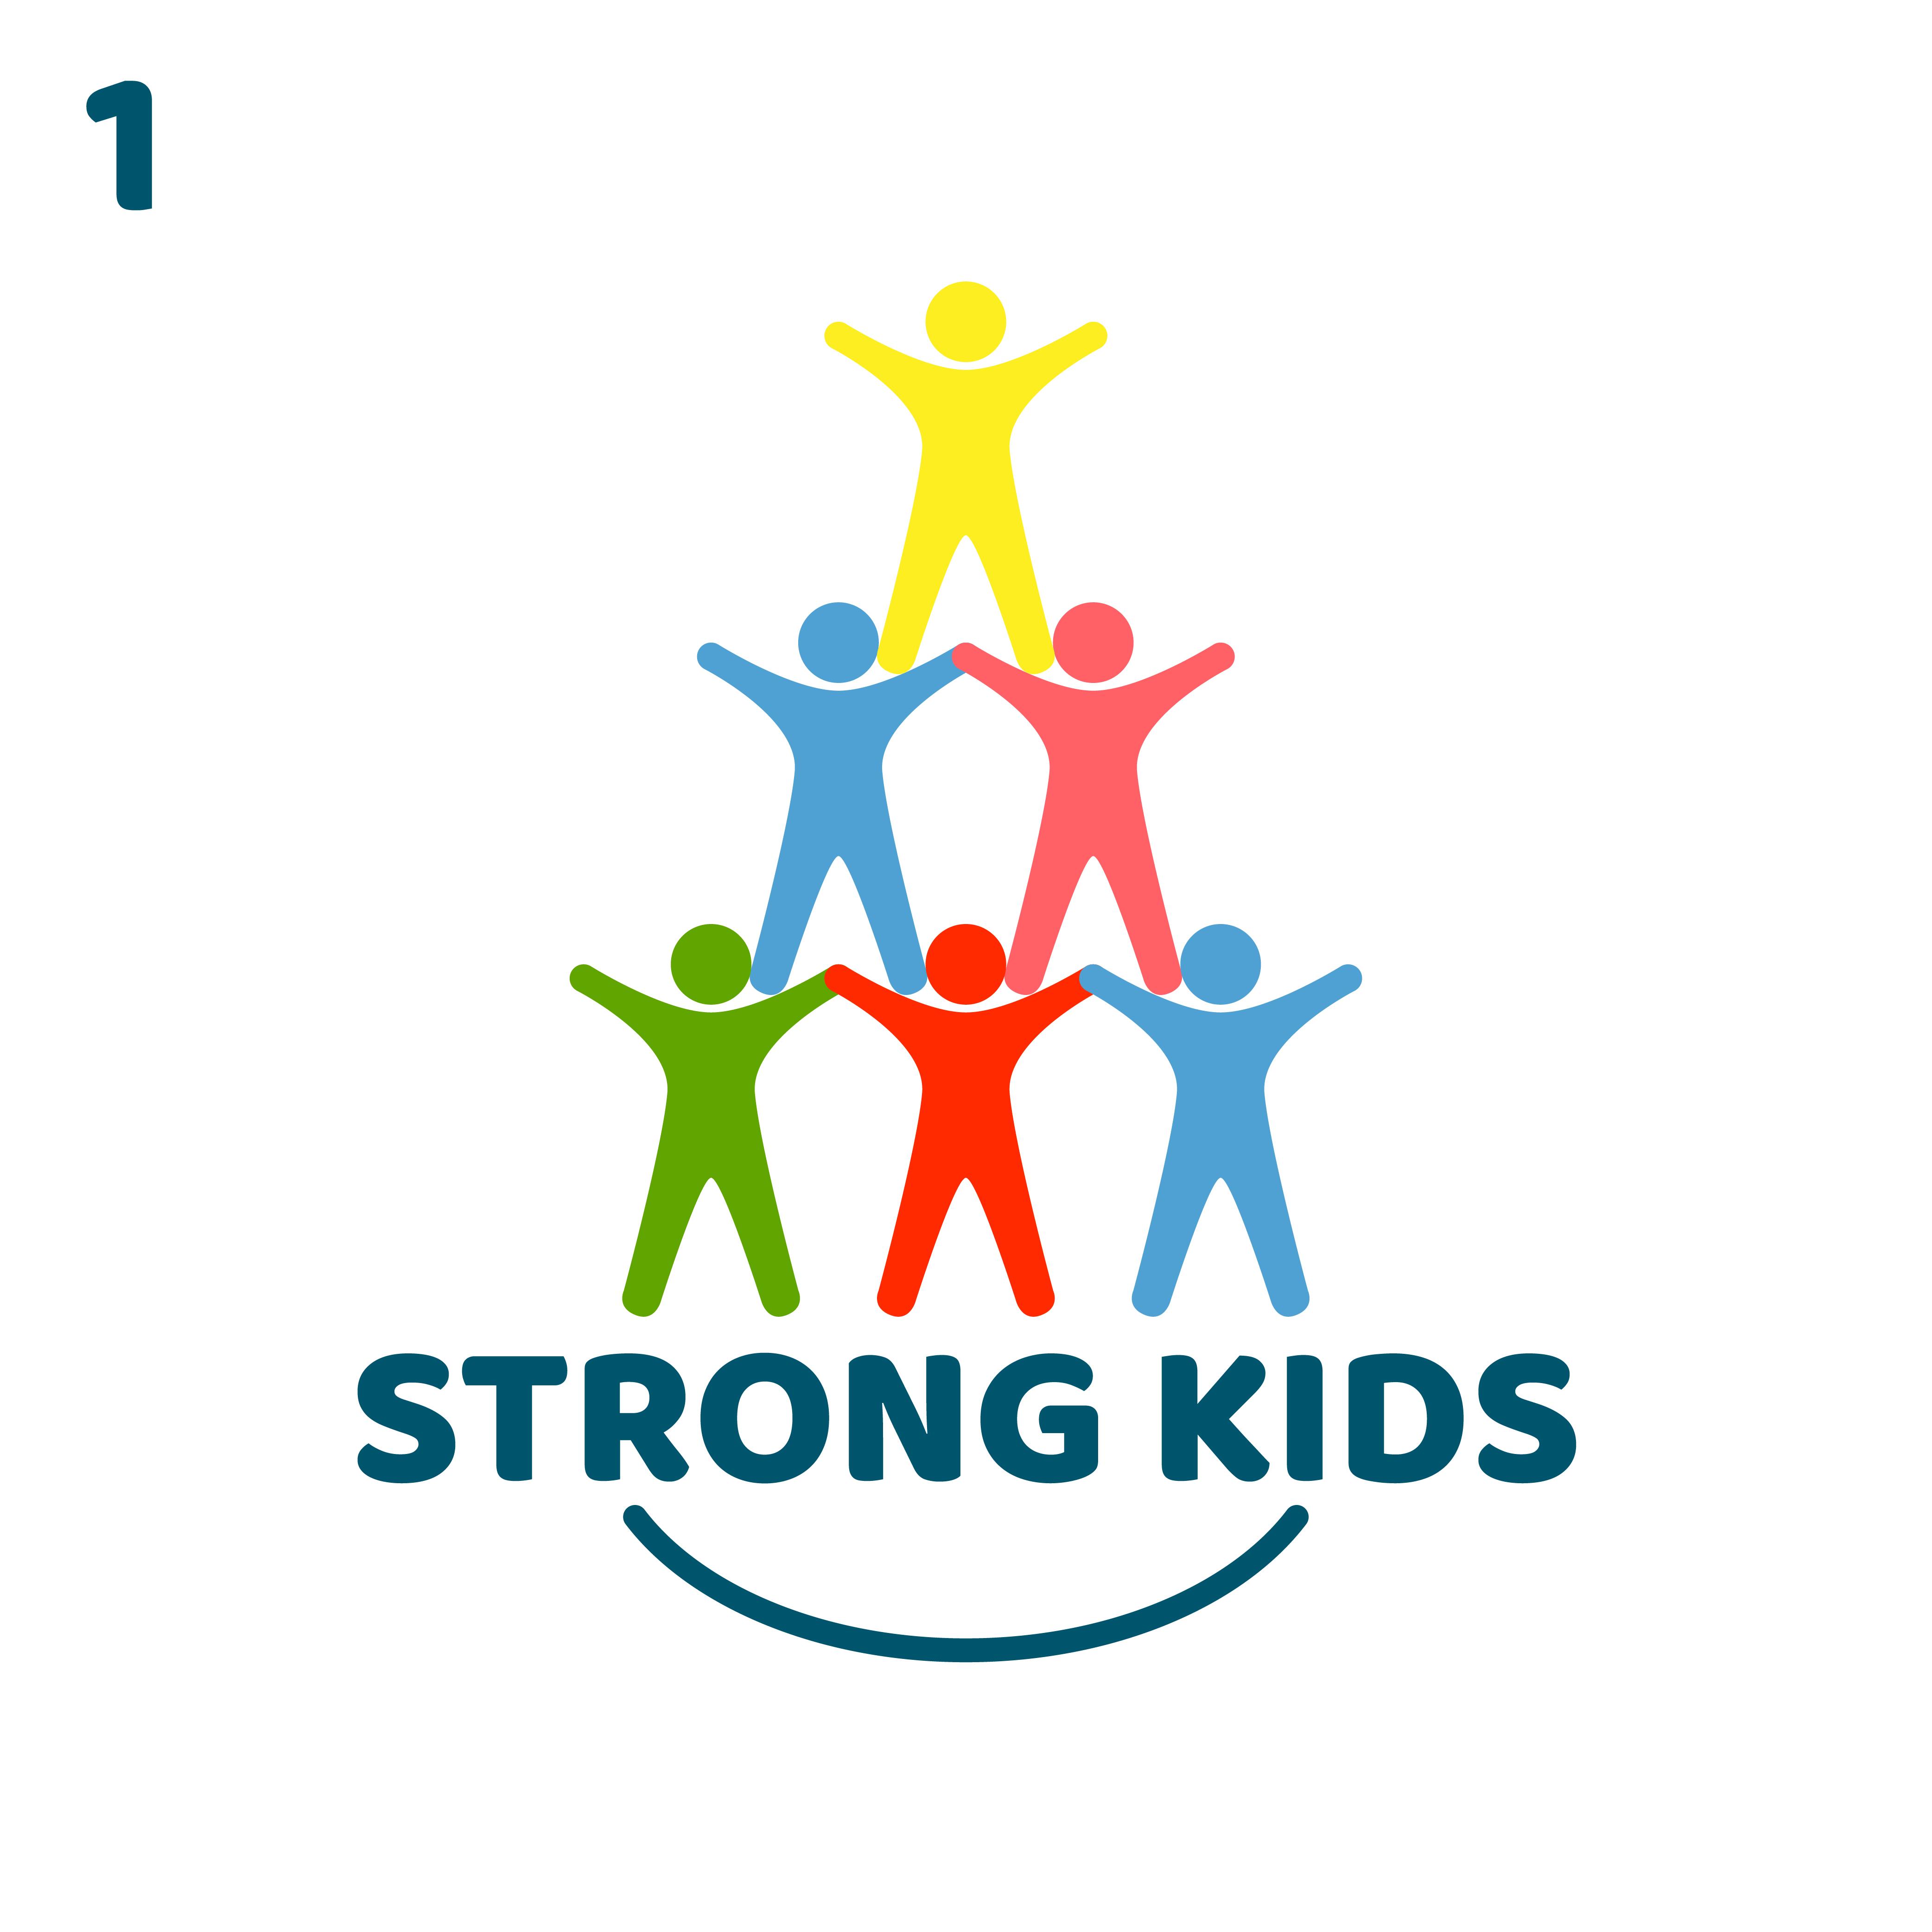 Логотип для Детского Интернет Магазина StrongKids фото f_4405c7002aac12a8.jpg